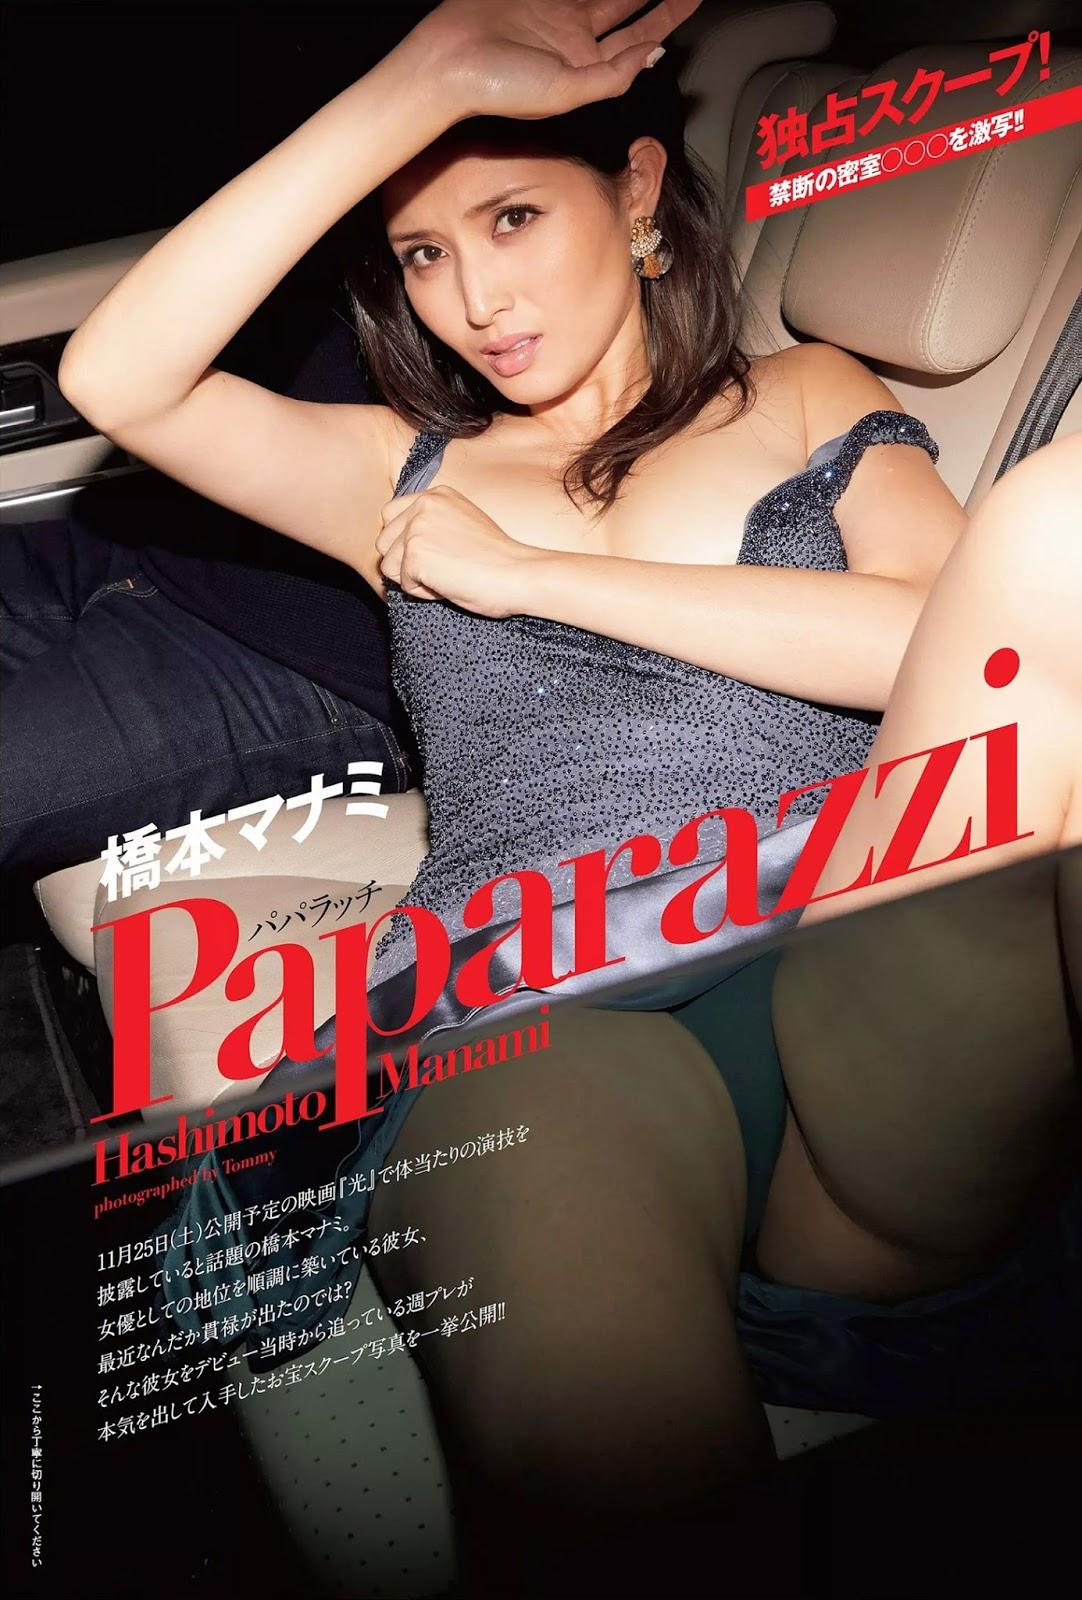 Manami Hashimoto 橋本マナミ, Weekly Playboy 2017 No.47 (週刊プレイボーイ 2017年47号